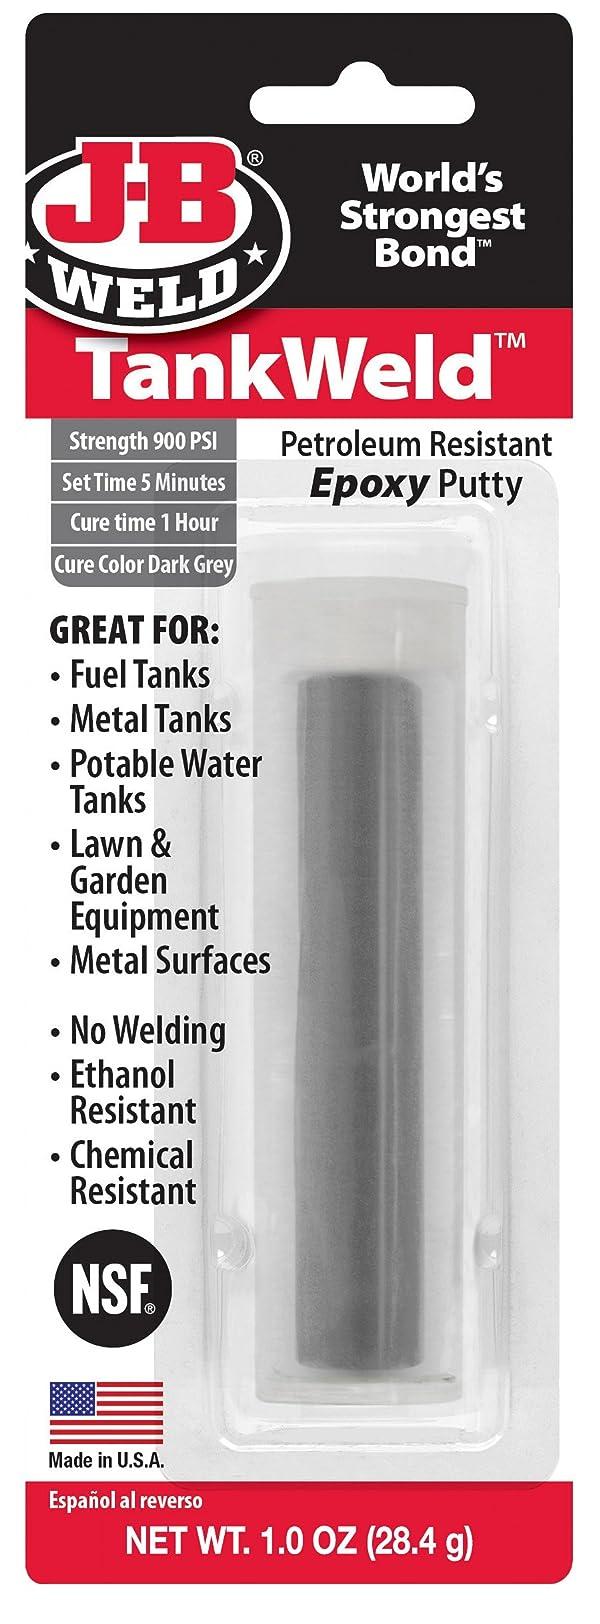 J-B Weld Dark Grey 8217 TankWeld Gas Tank Repair-1 oz, 1. Fluid_Ounces (Color: Dark Grey, Tamaño: 1 Ounce)